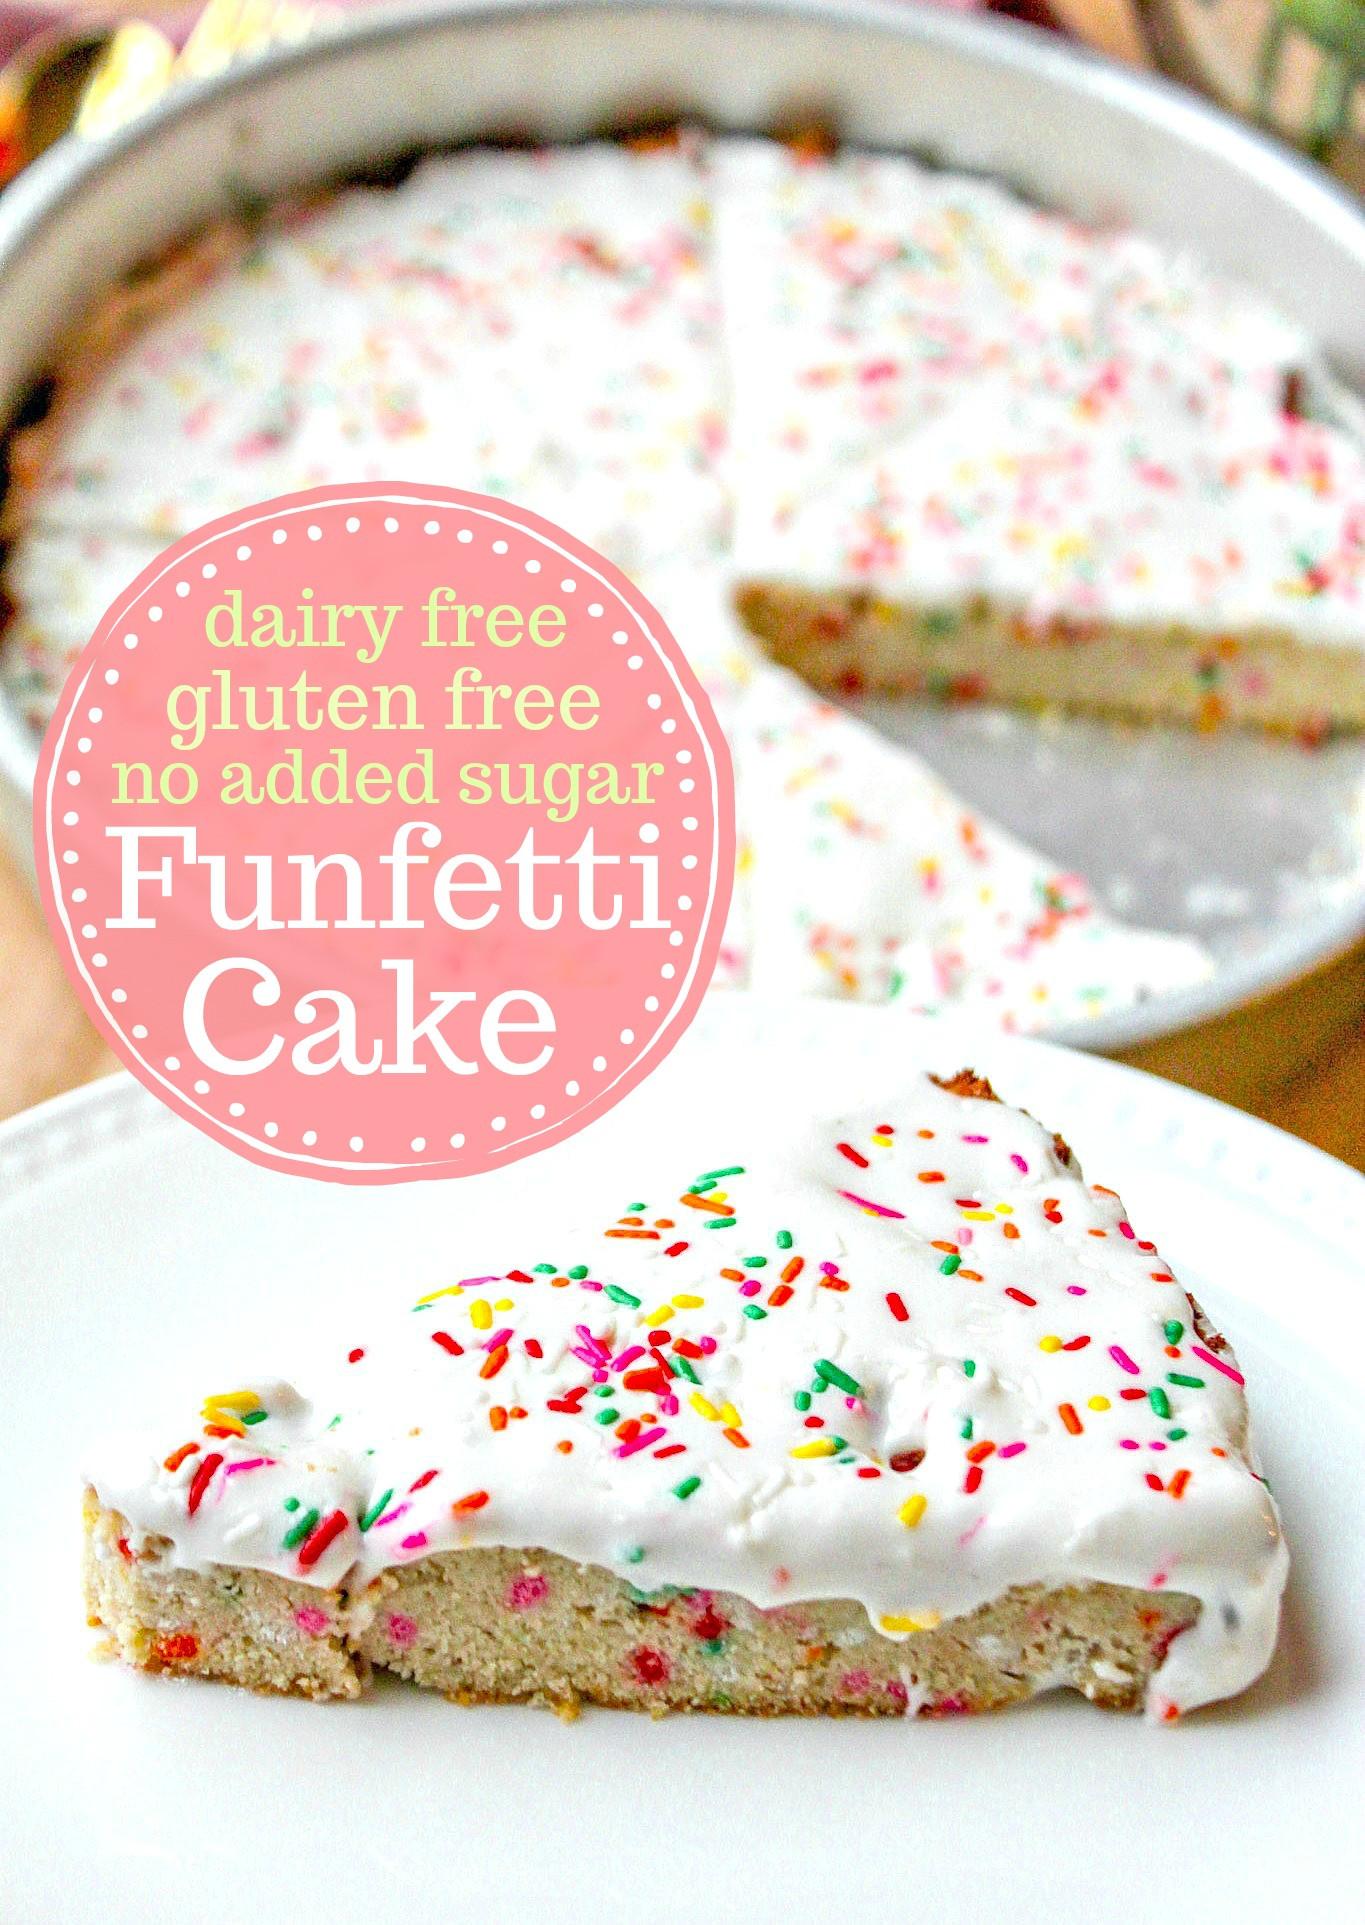 Dairy Free Birthday Cake To Buy  Funfetti Cake Dairy & Grain Free No Added Sugars